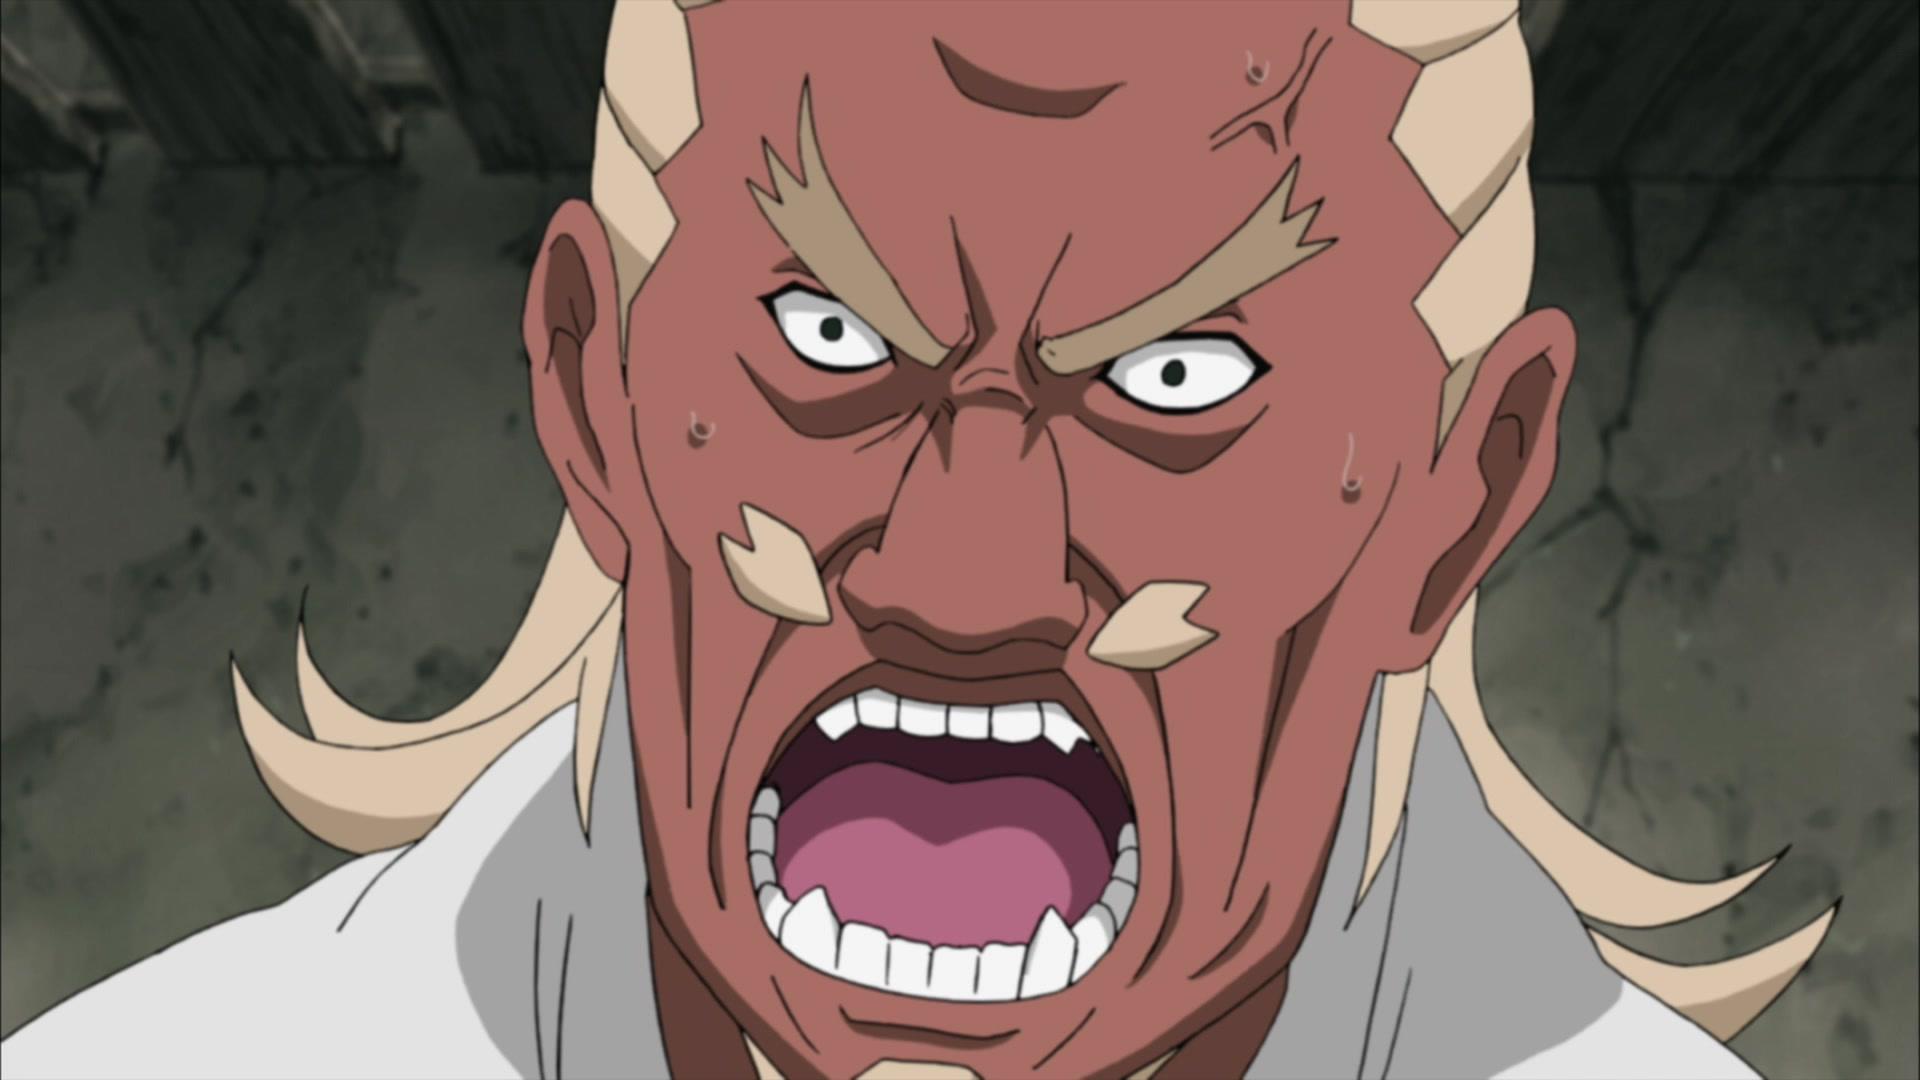 Naruto Shippuden: The Seven Ninja Swordsmen of the Mist